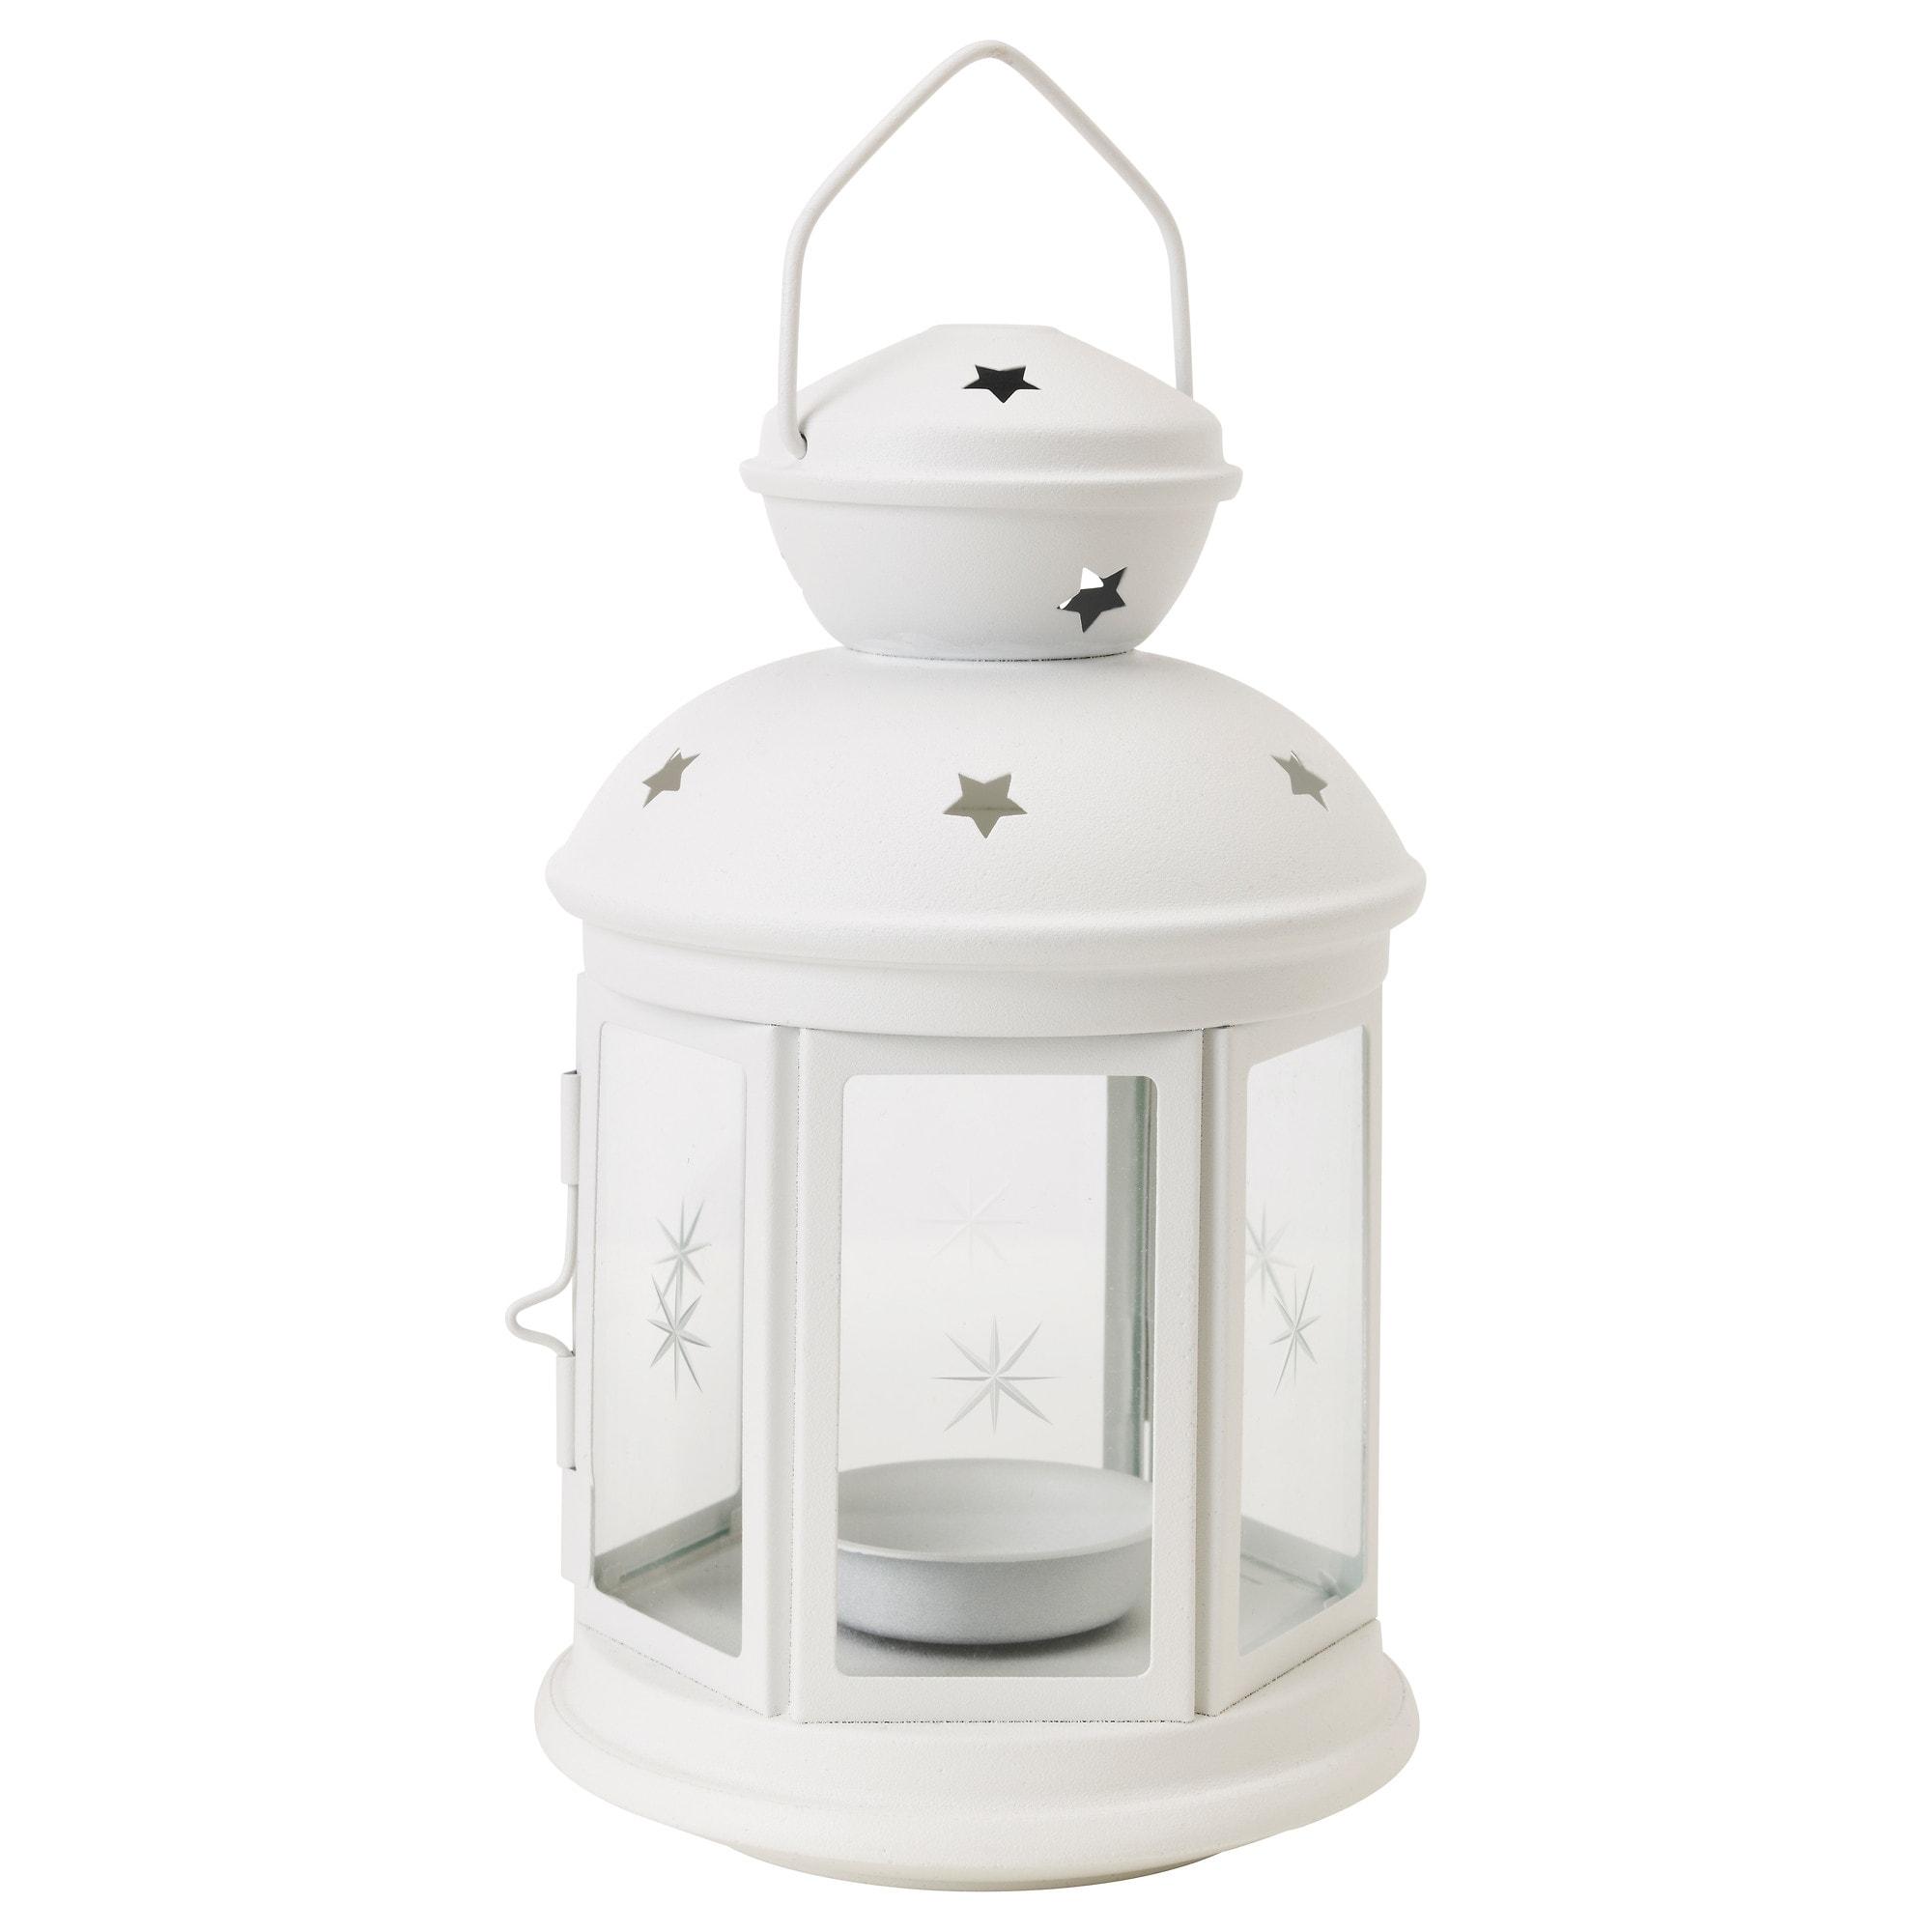 Rotera Lantern For Tealight In/outdoor White 21 Cm - Ikea regarding Outdoor Grey Lanterns (Image 14 of 20)